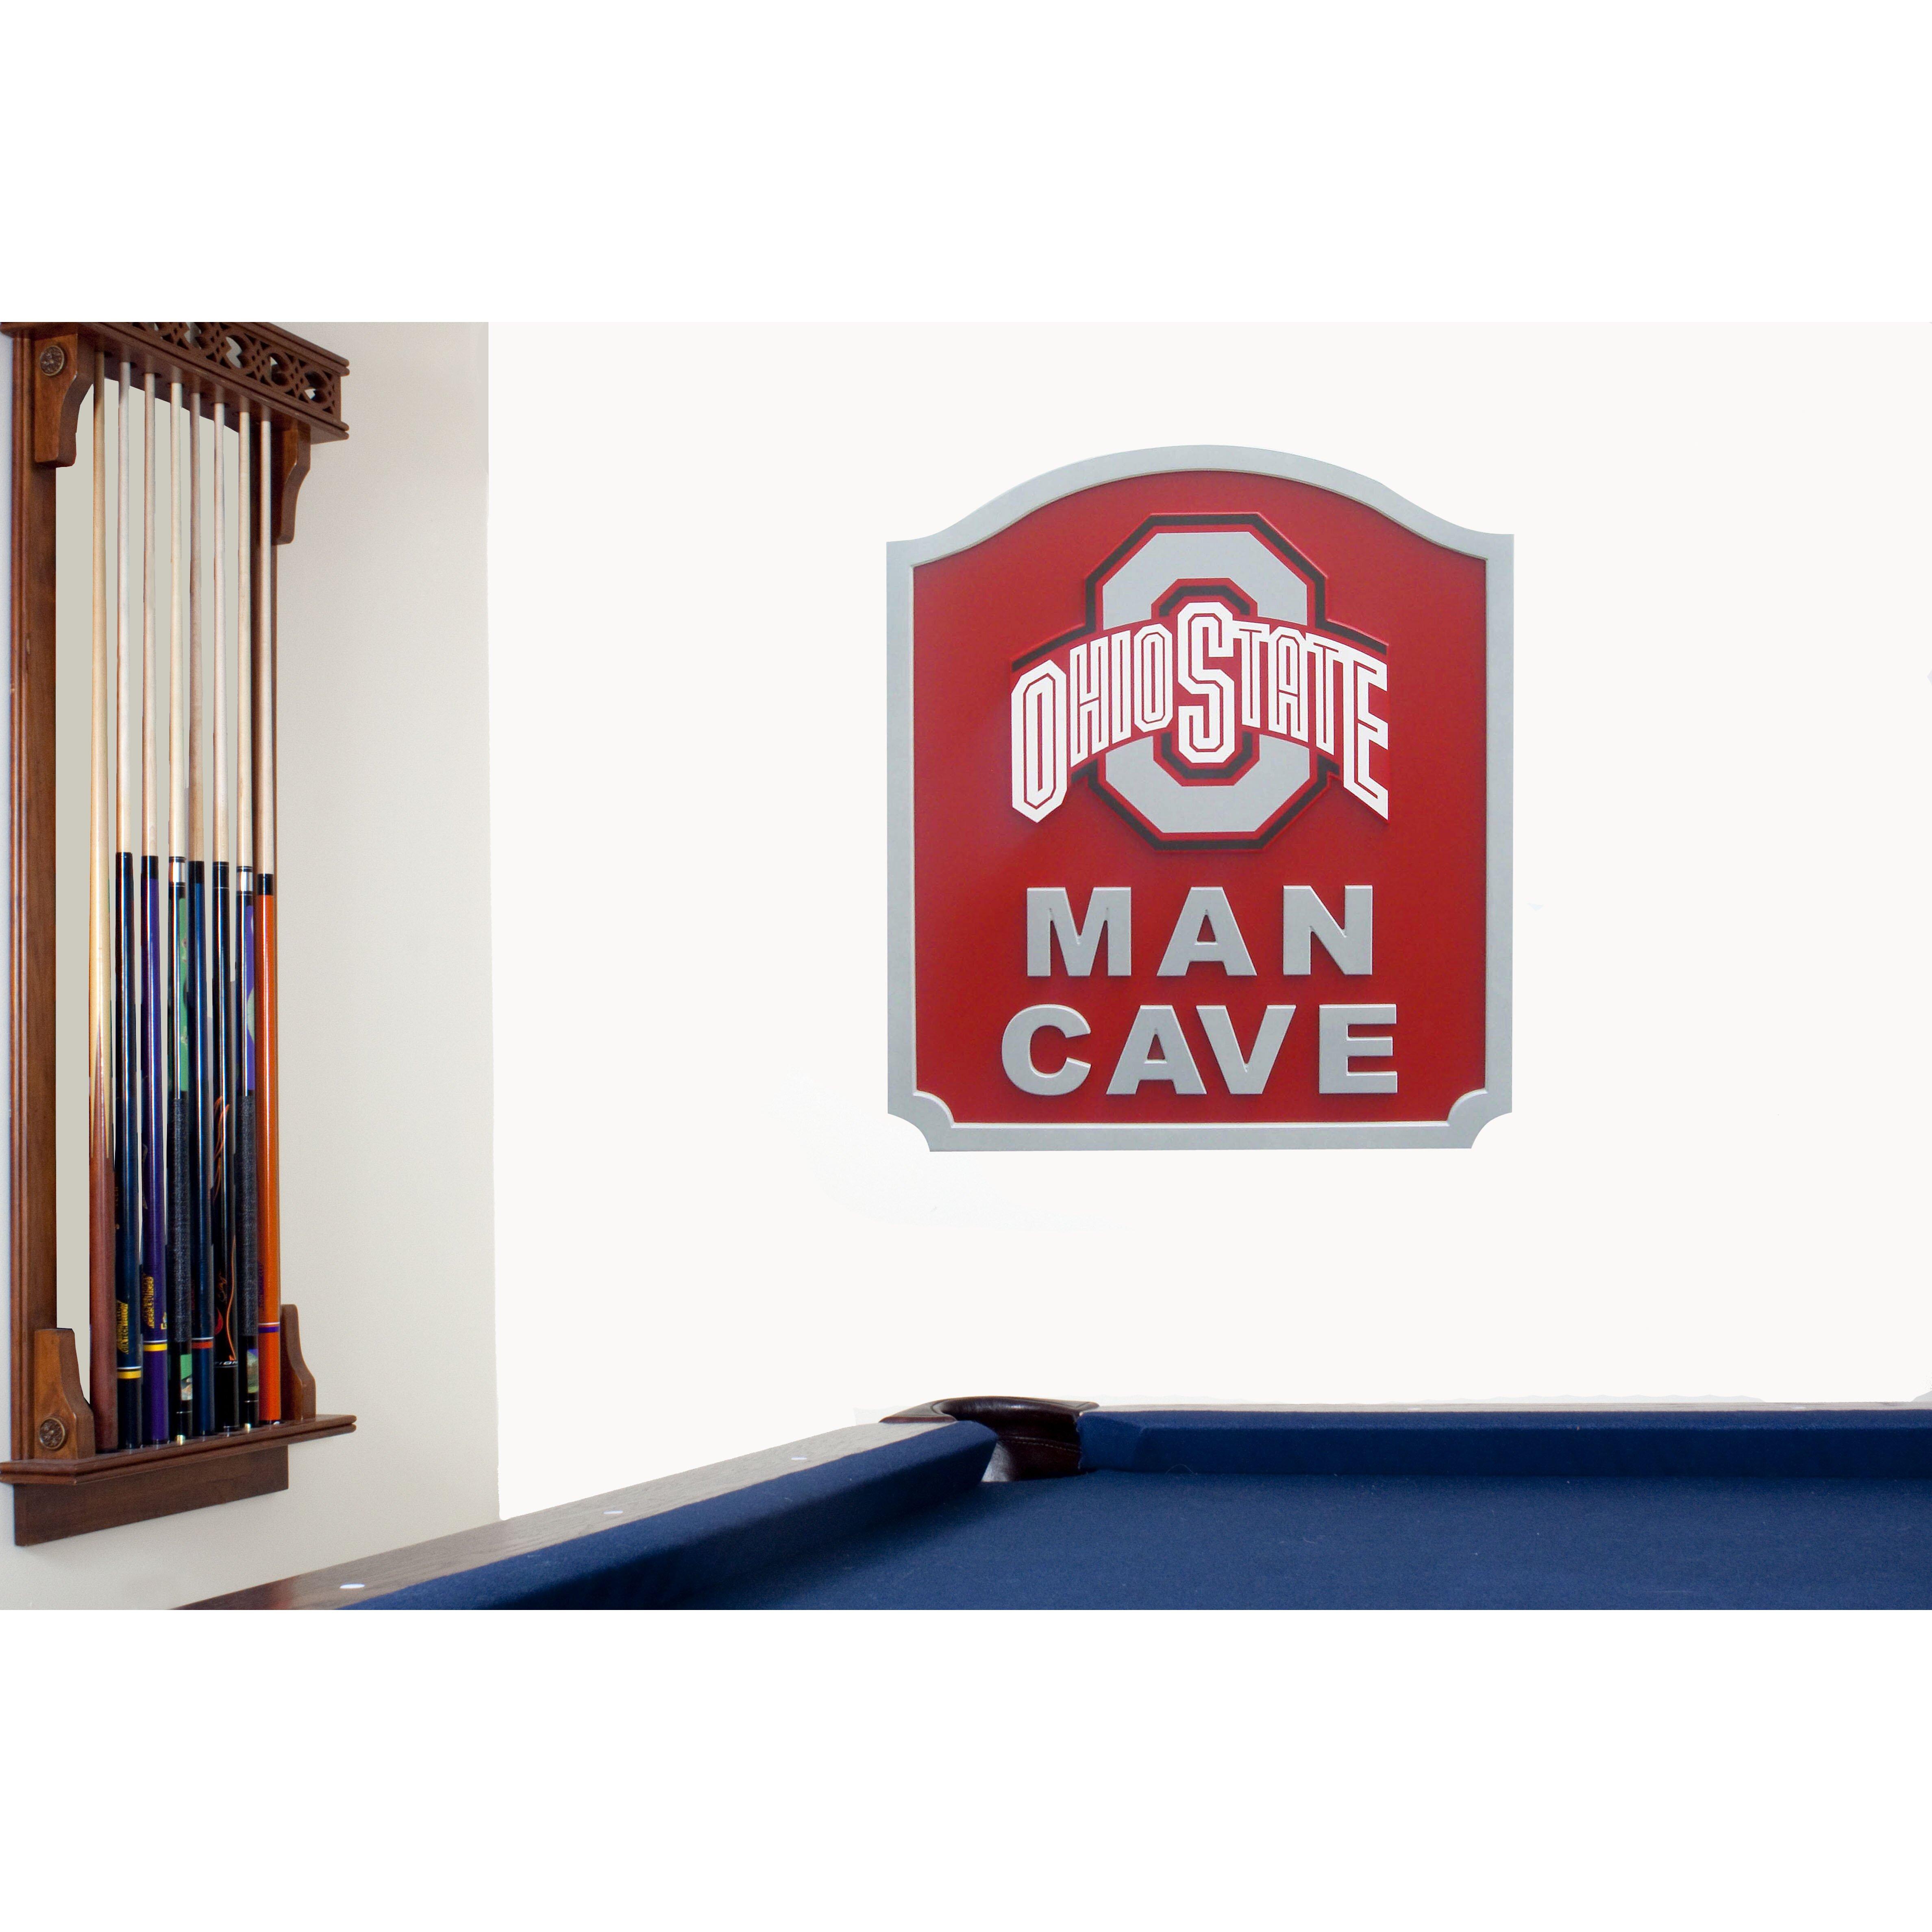 Fan Creations NCAA Man Cave Textual Art Plaque amp Reviews  : Fan Creations NCAA Man Cave Textual Art Plaque from www.wayfair.com size 4752 x 4752 jpeg 966kB